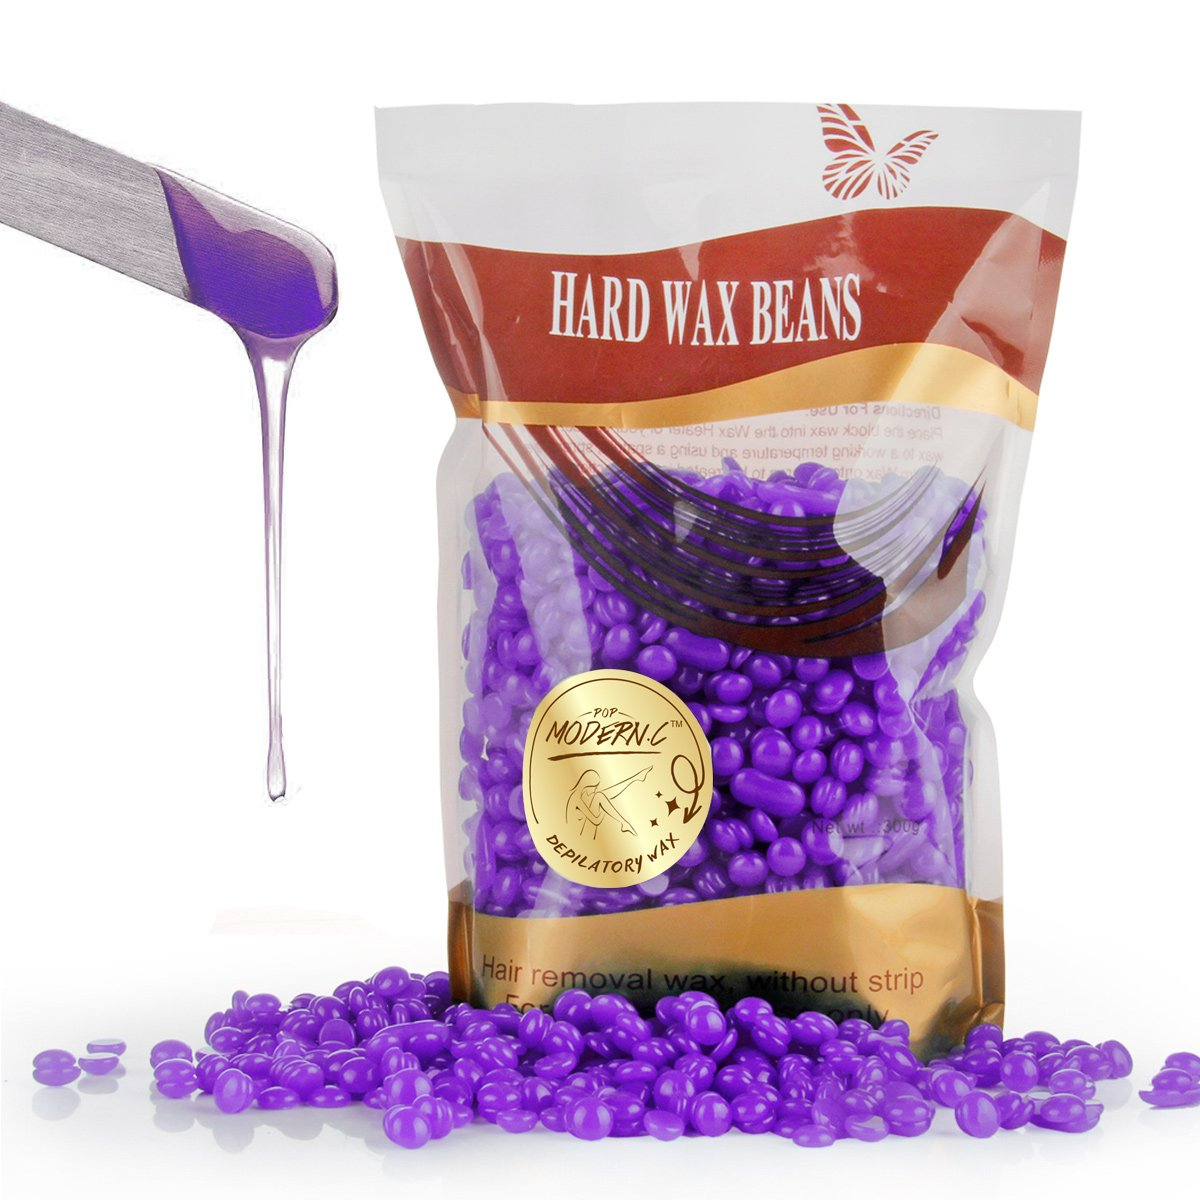 Wax Bean Hair Removal Brazilian Pearl DepilatoryWaxing Beads for Men Women Chest Face Body BikiniArm Leg Armpits Hair Removal 300G (10.6oz) (Lavender)